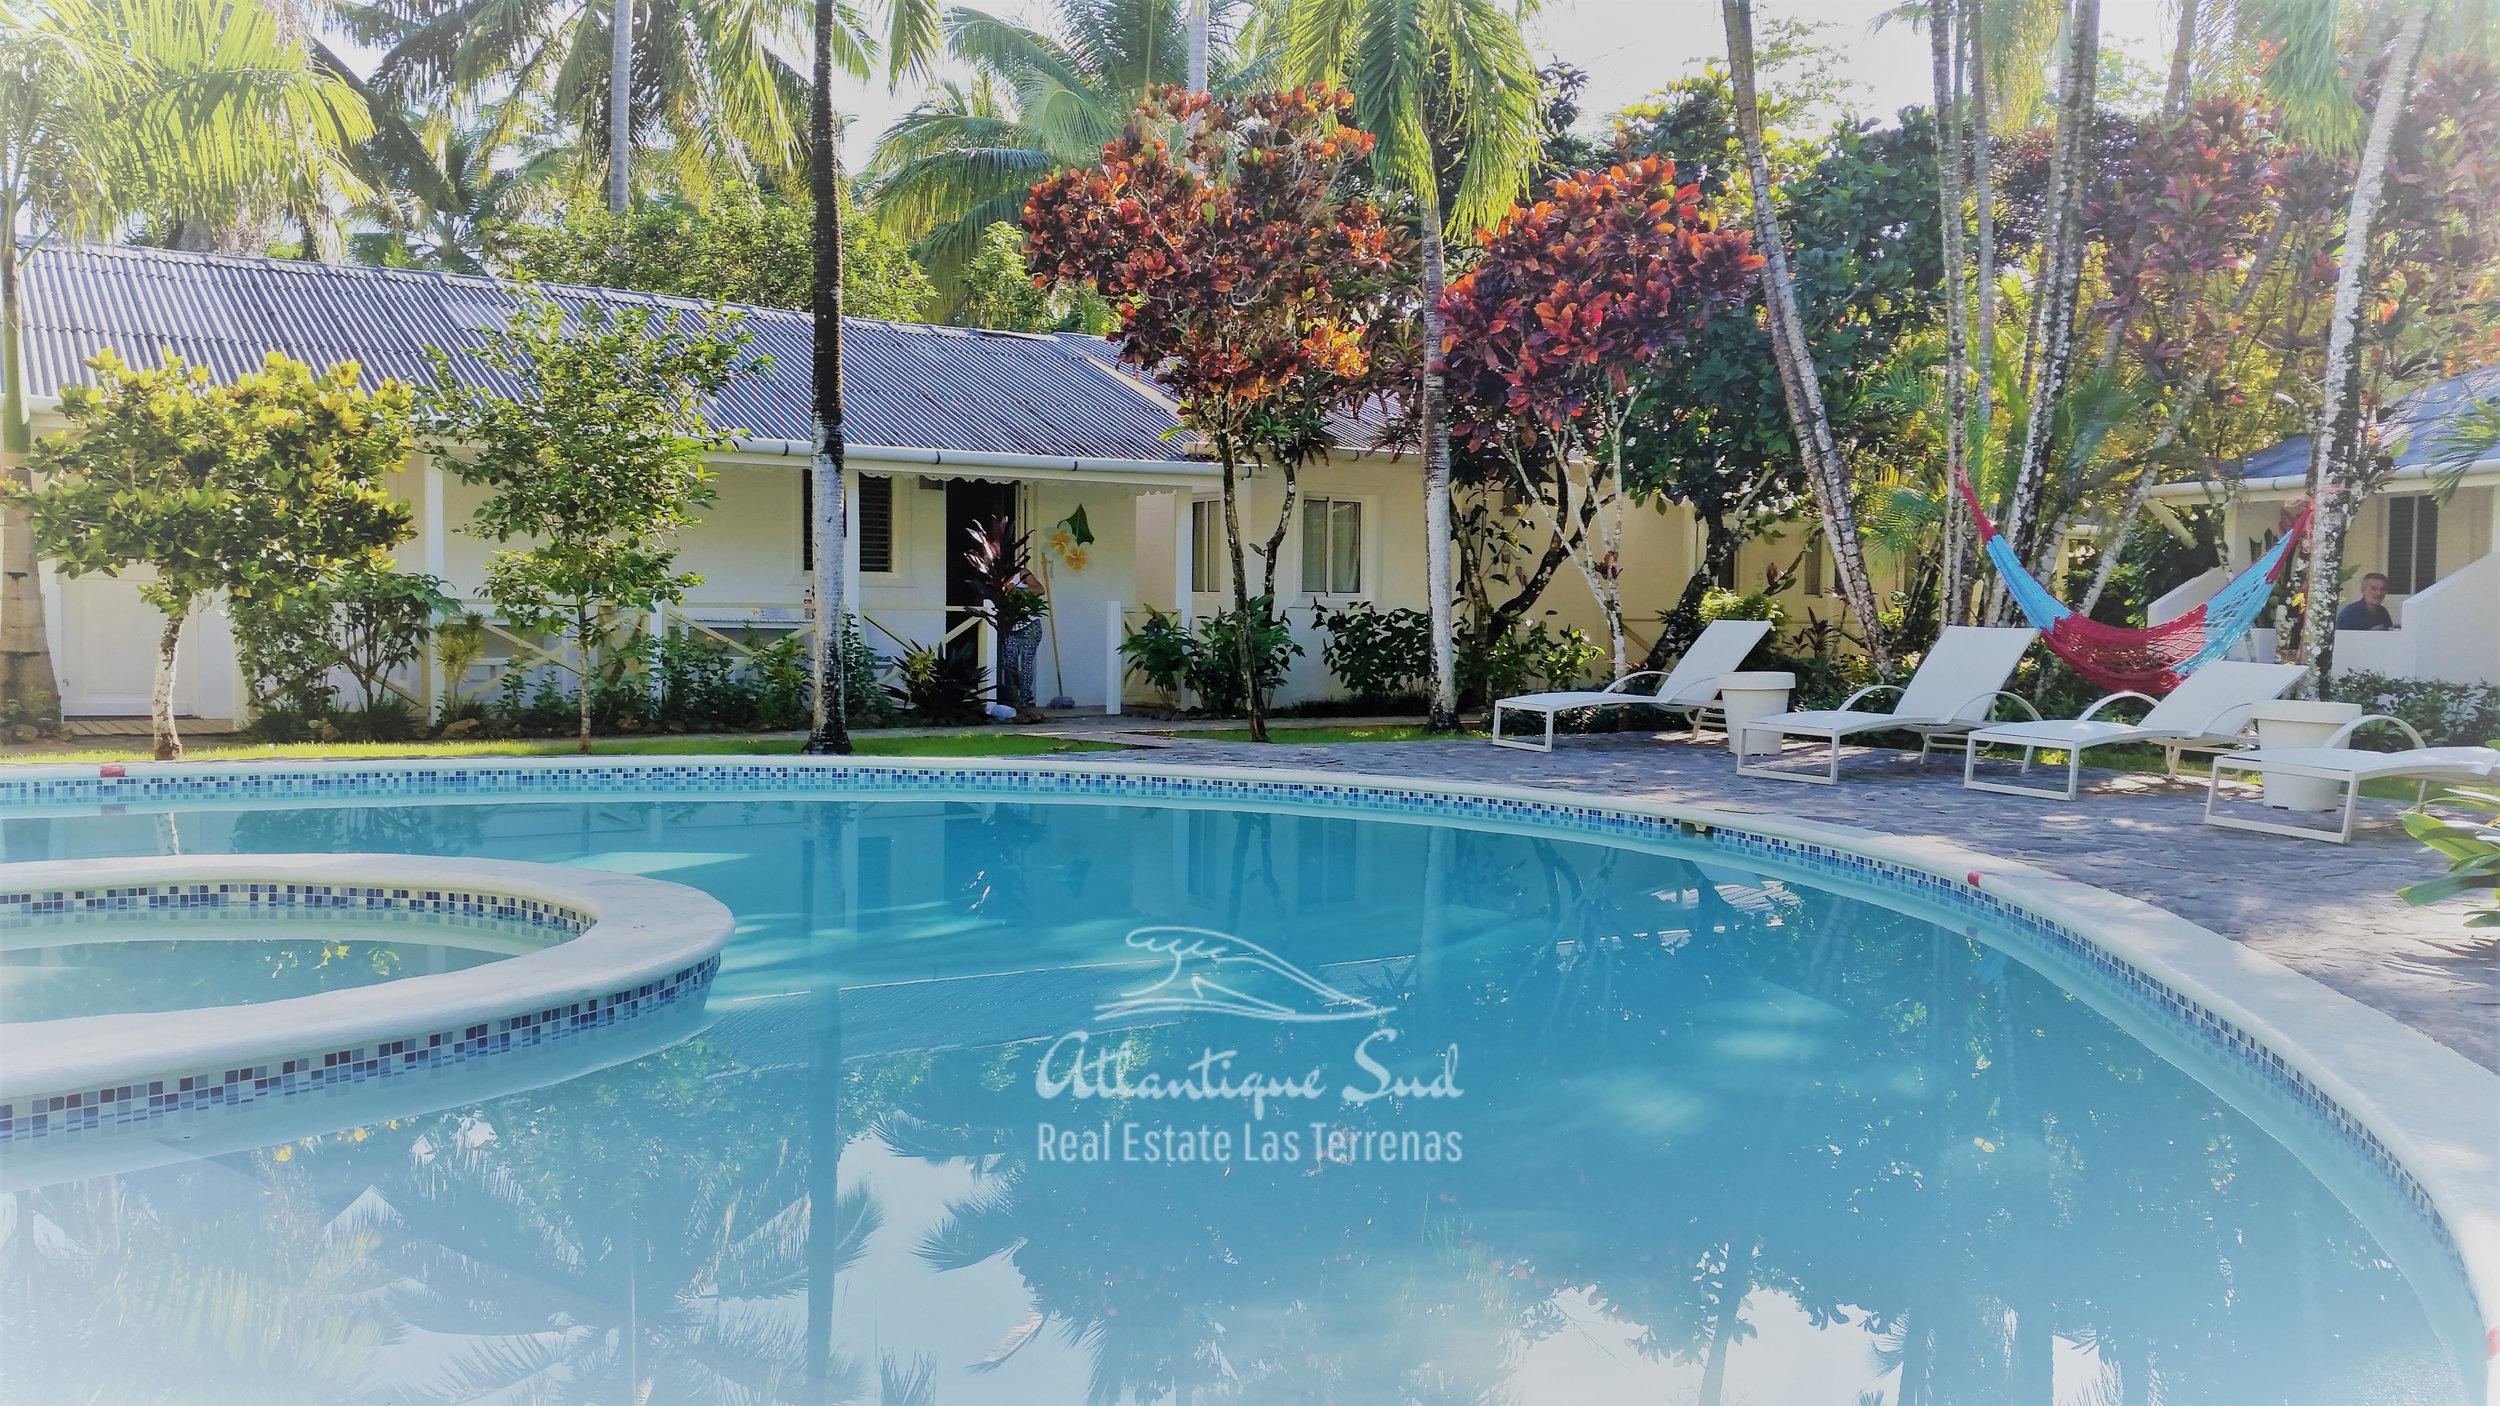 Small hotel for sale next to the beach Real Estate Las Terrenas Atlantique Sud Dominican Republic9.jpg